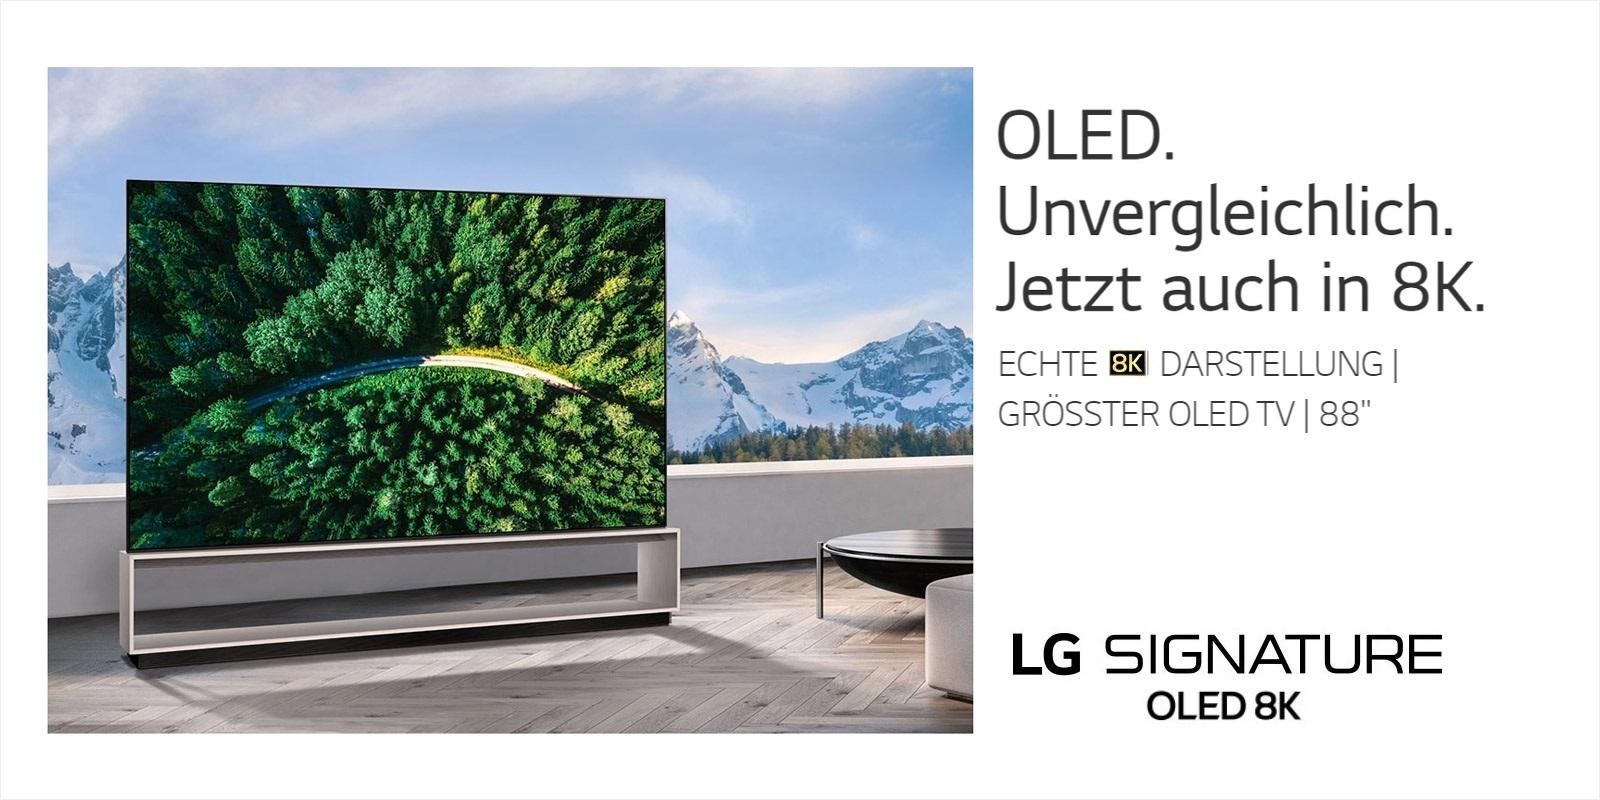 LG OLED TV 4K / 8K bei uns in den Reisenberger Galerien.   LG OLED TVs sind die …